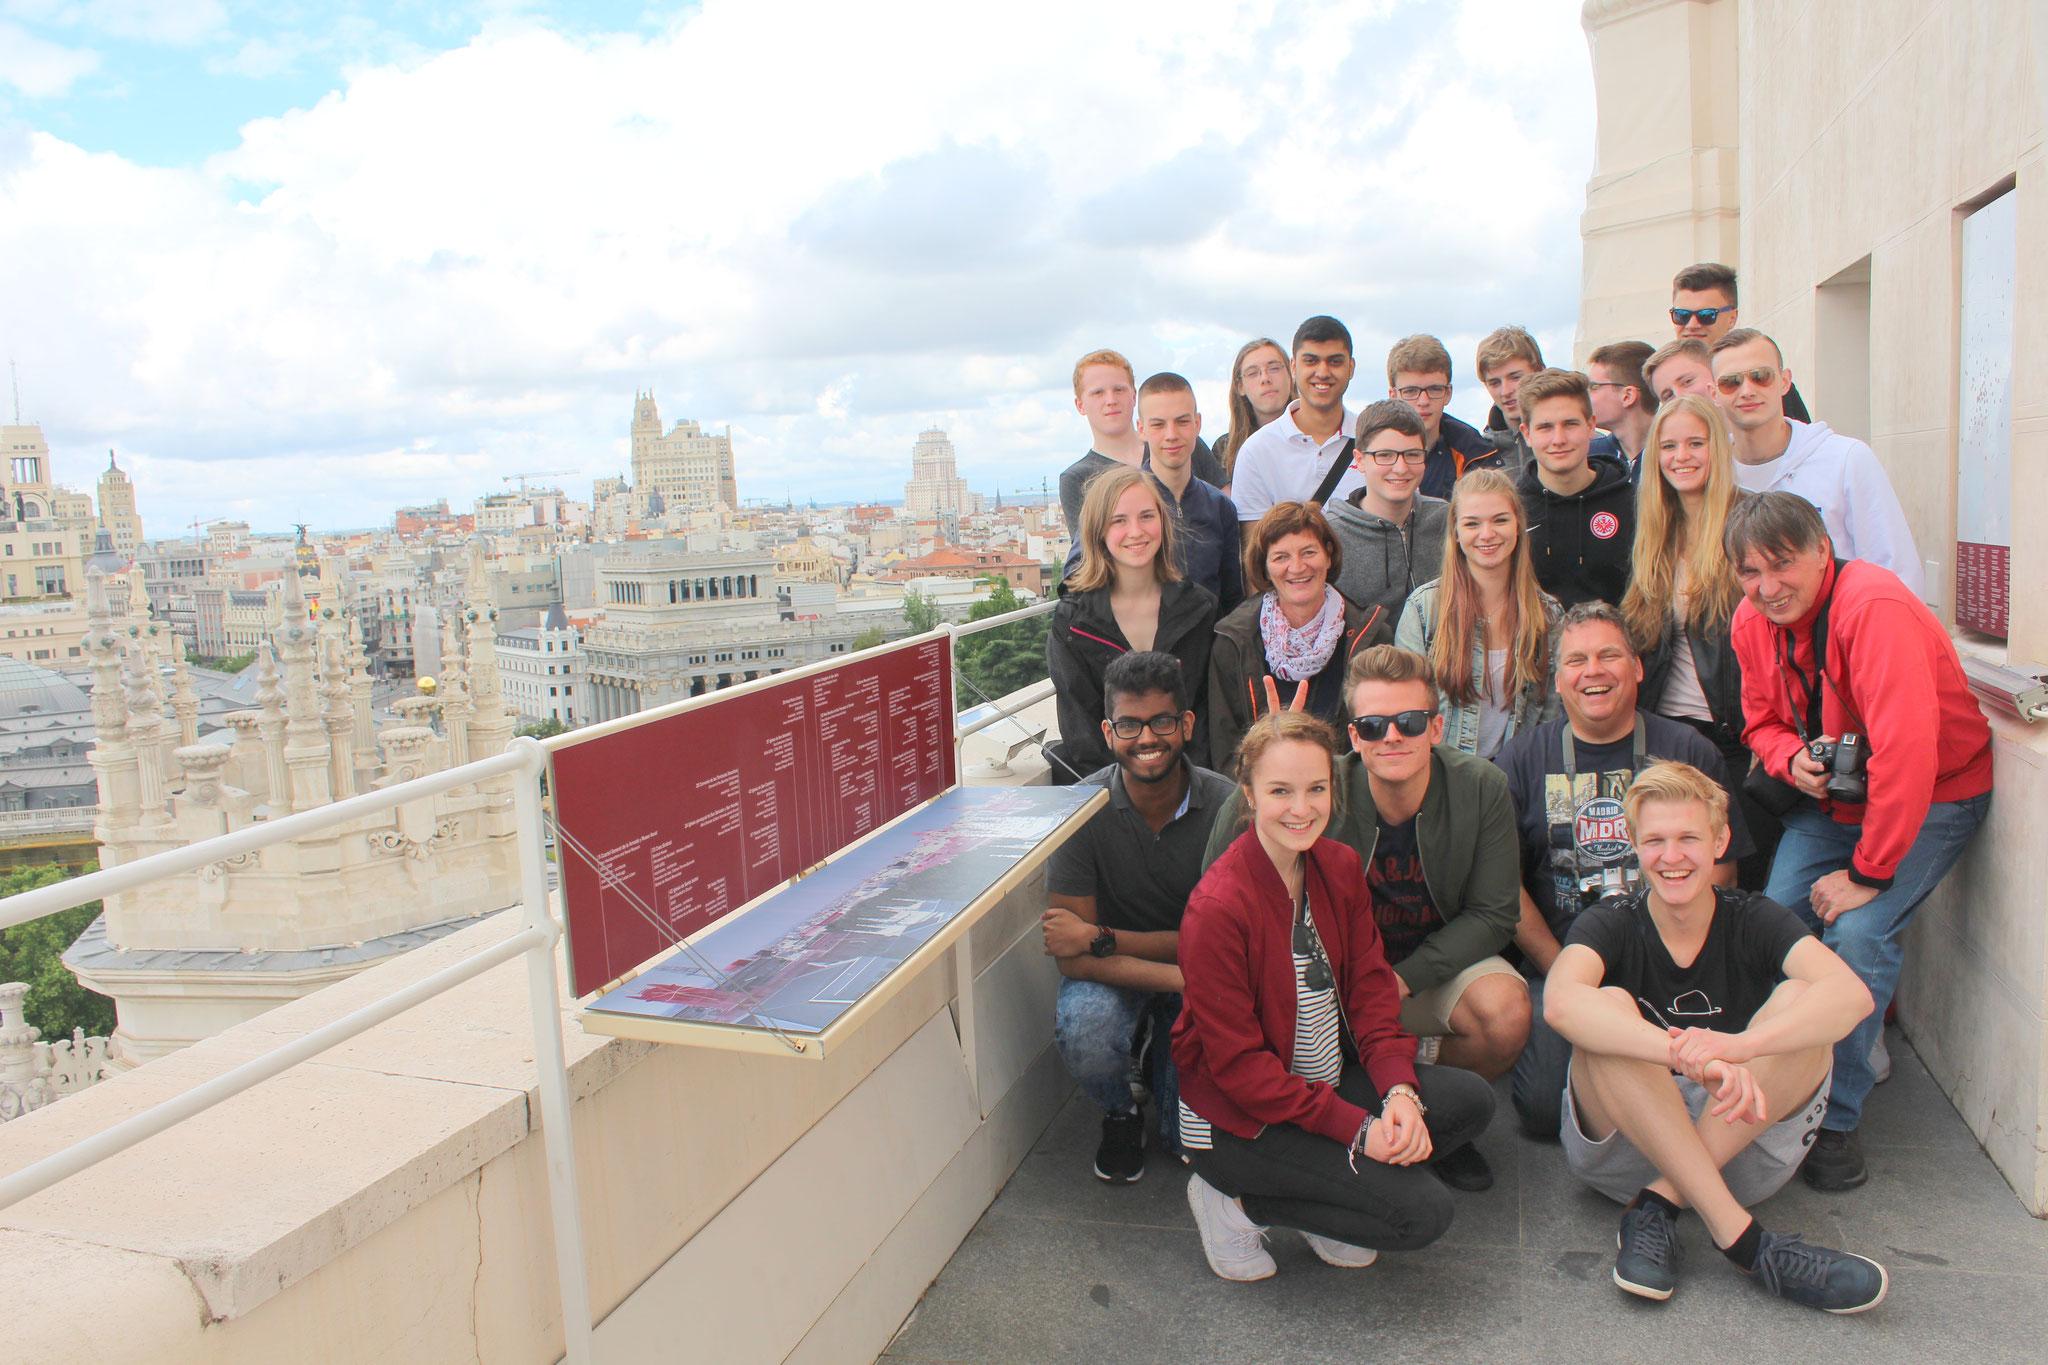 Spanischkurs in Madrid, 2. Reihe rechts Hr. Brendel, links daneben Hr. Peppler